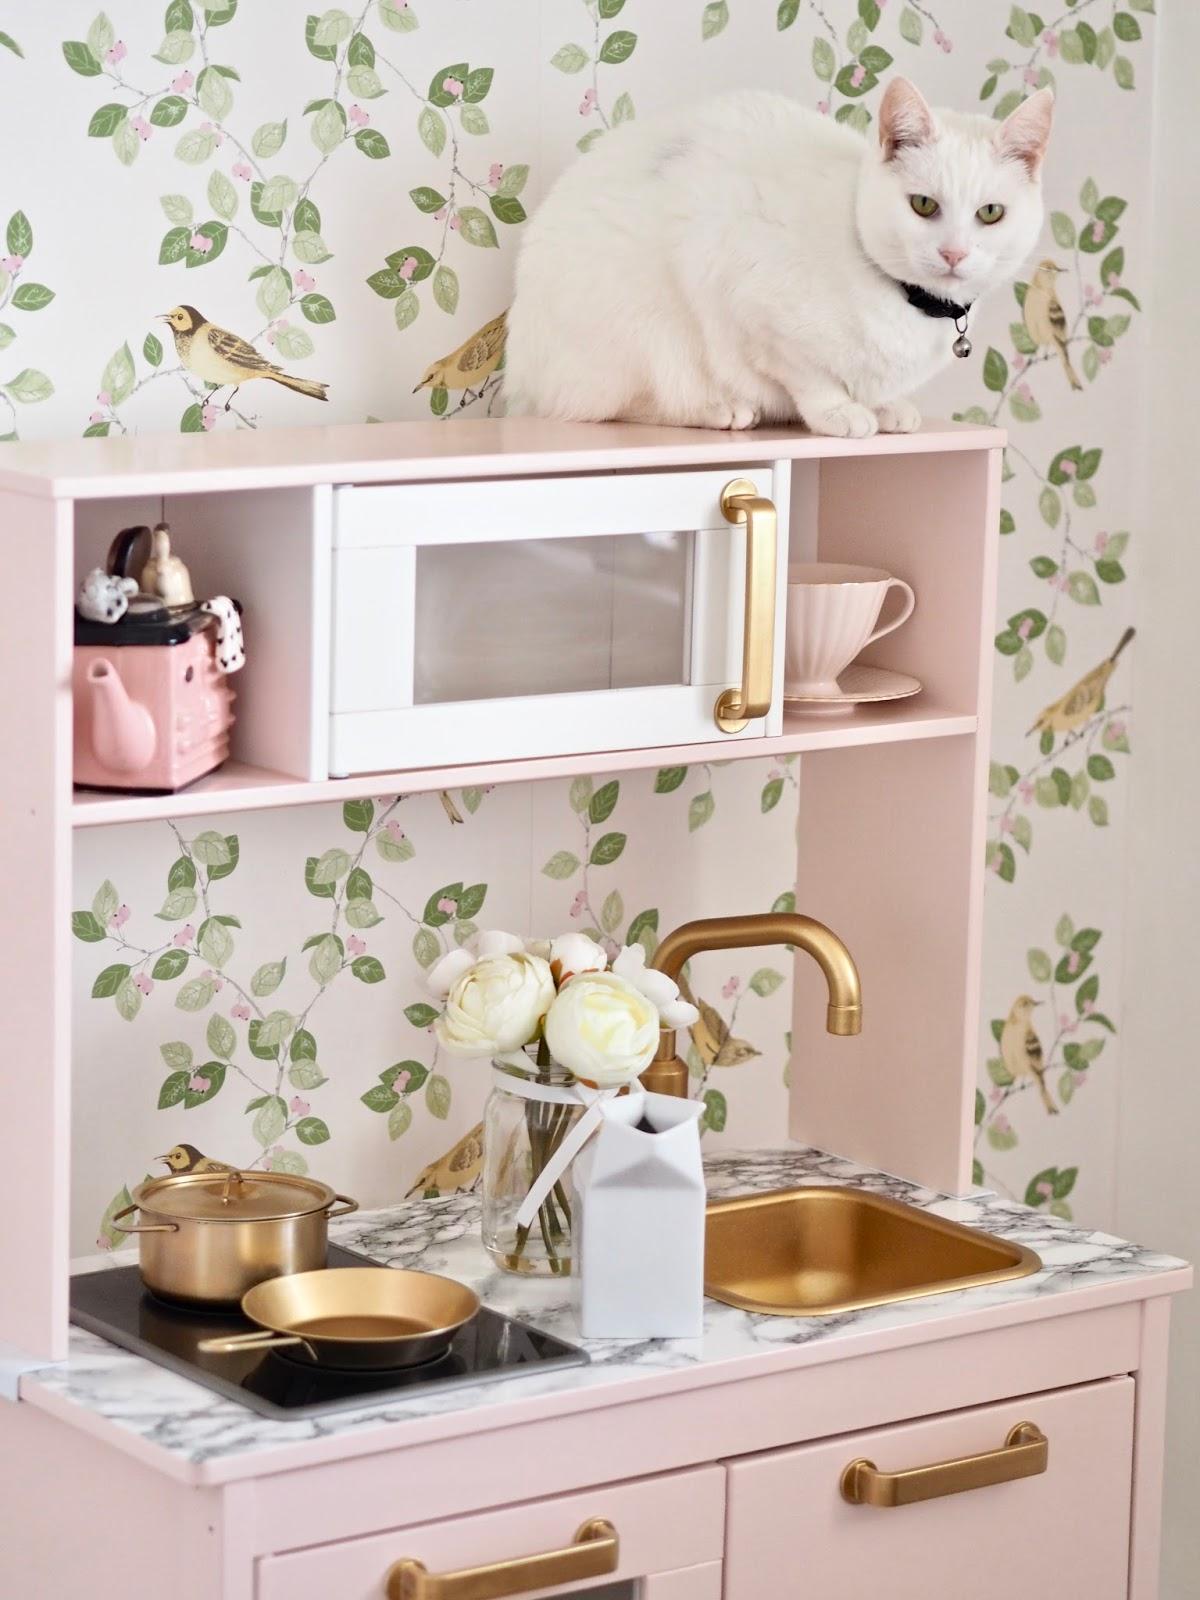 Ikea Duktig play kitchen makeover - Dainty Dress Diaries